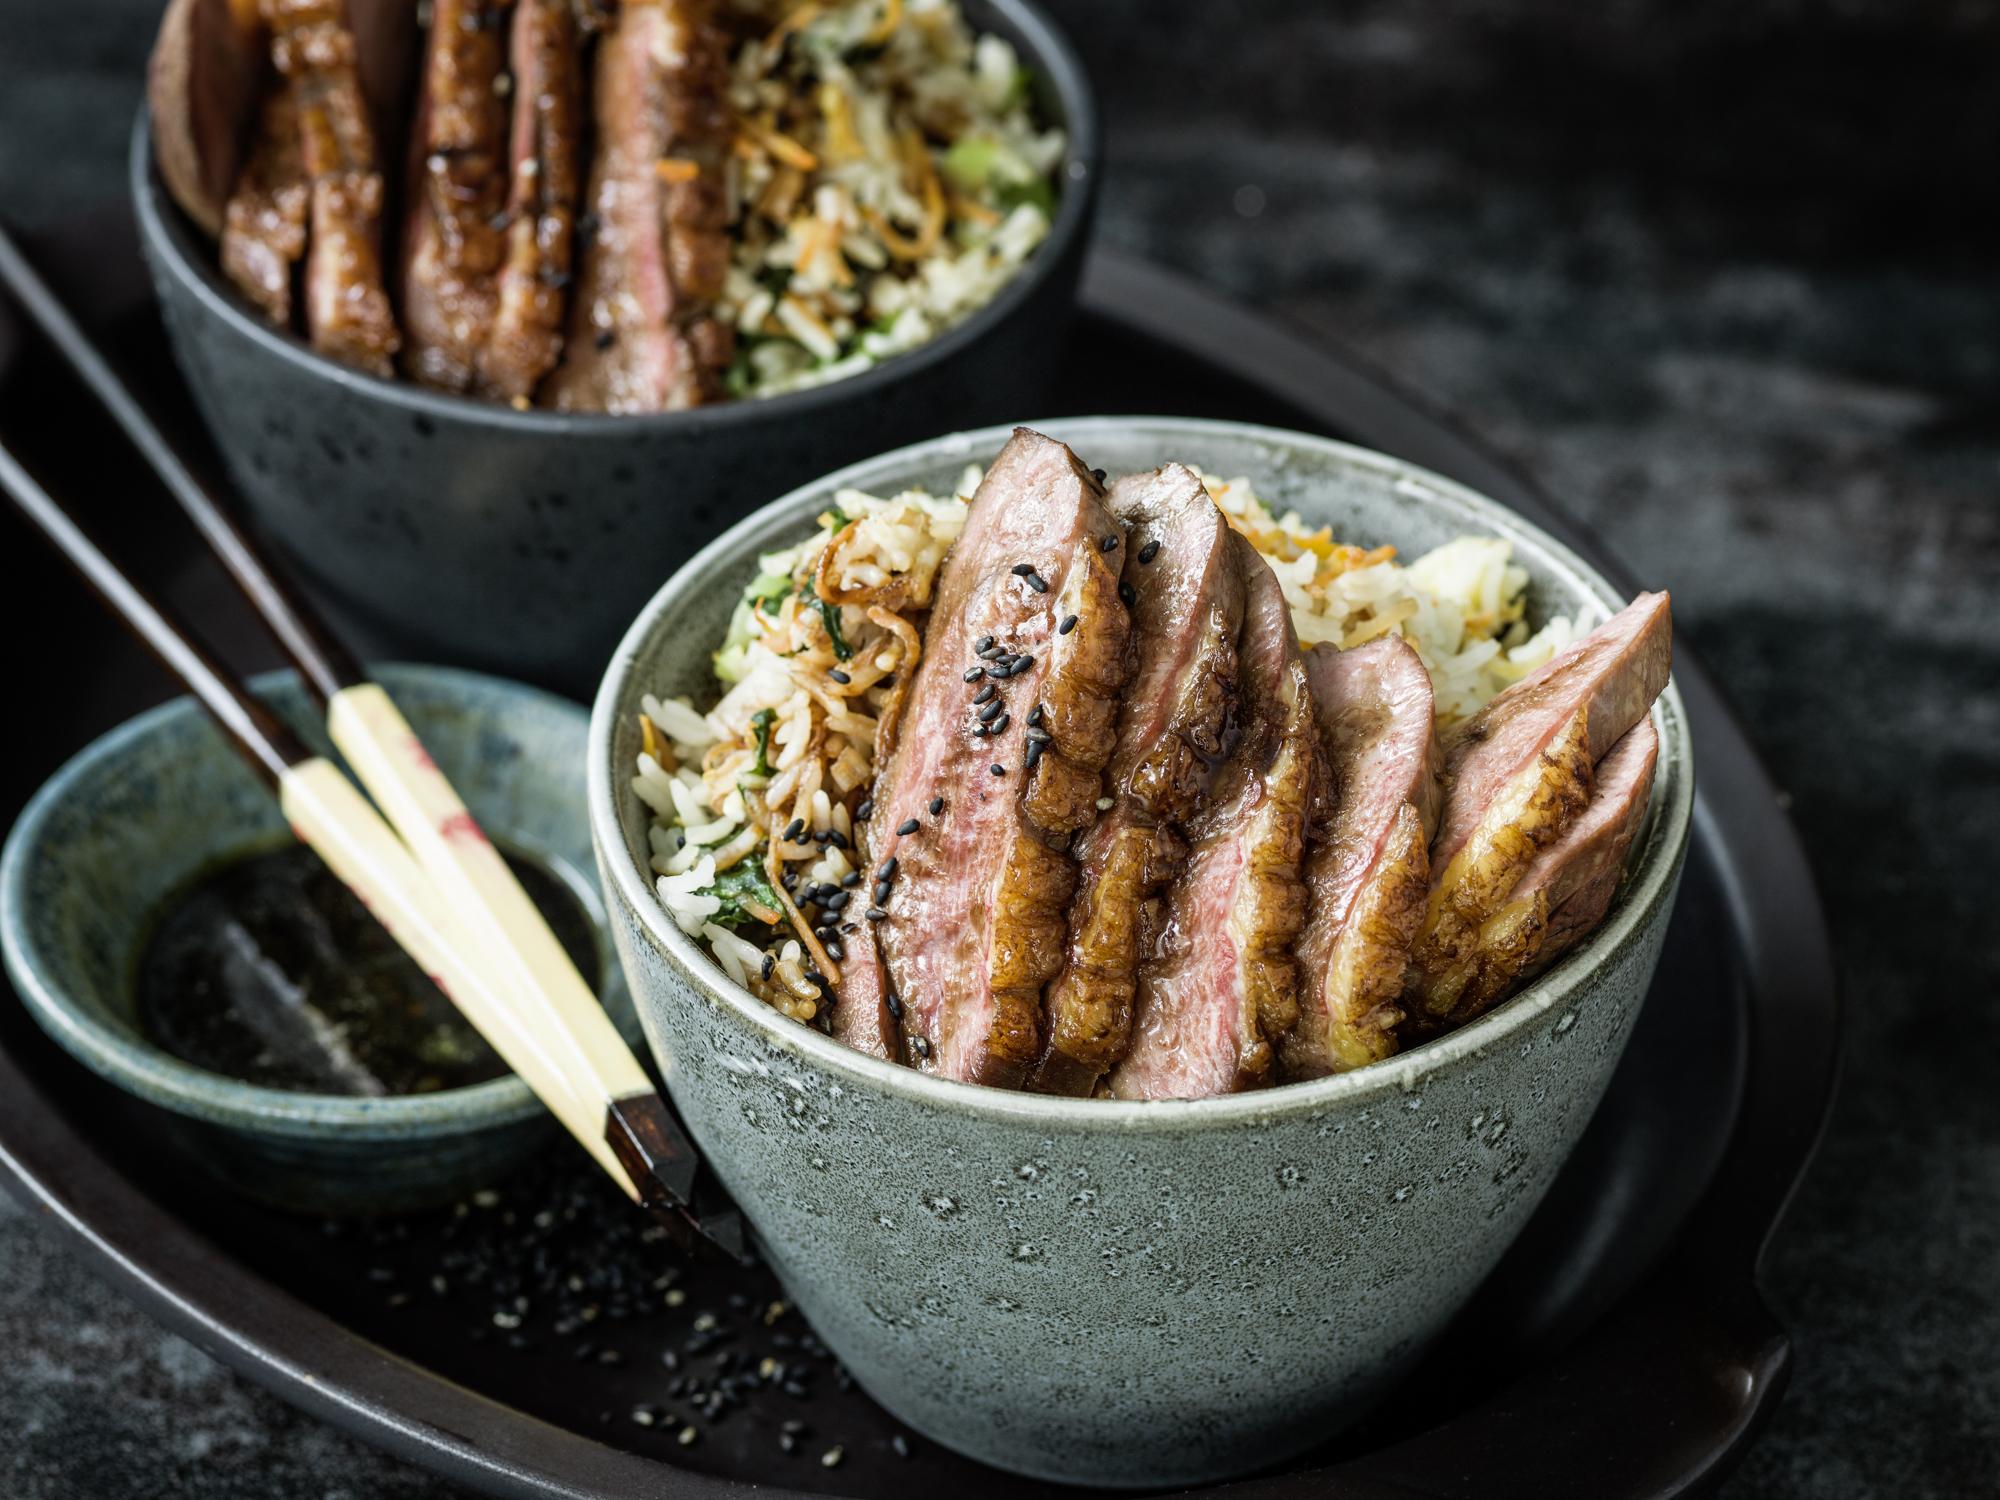 Food-Fotografie Meatlove, Stefan Schmidlin Fotograf Basel; Bild 13.jpg